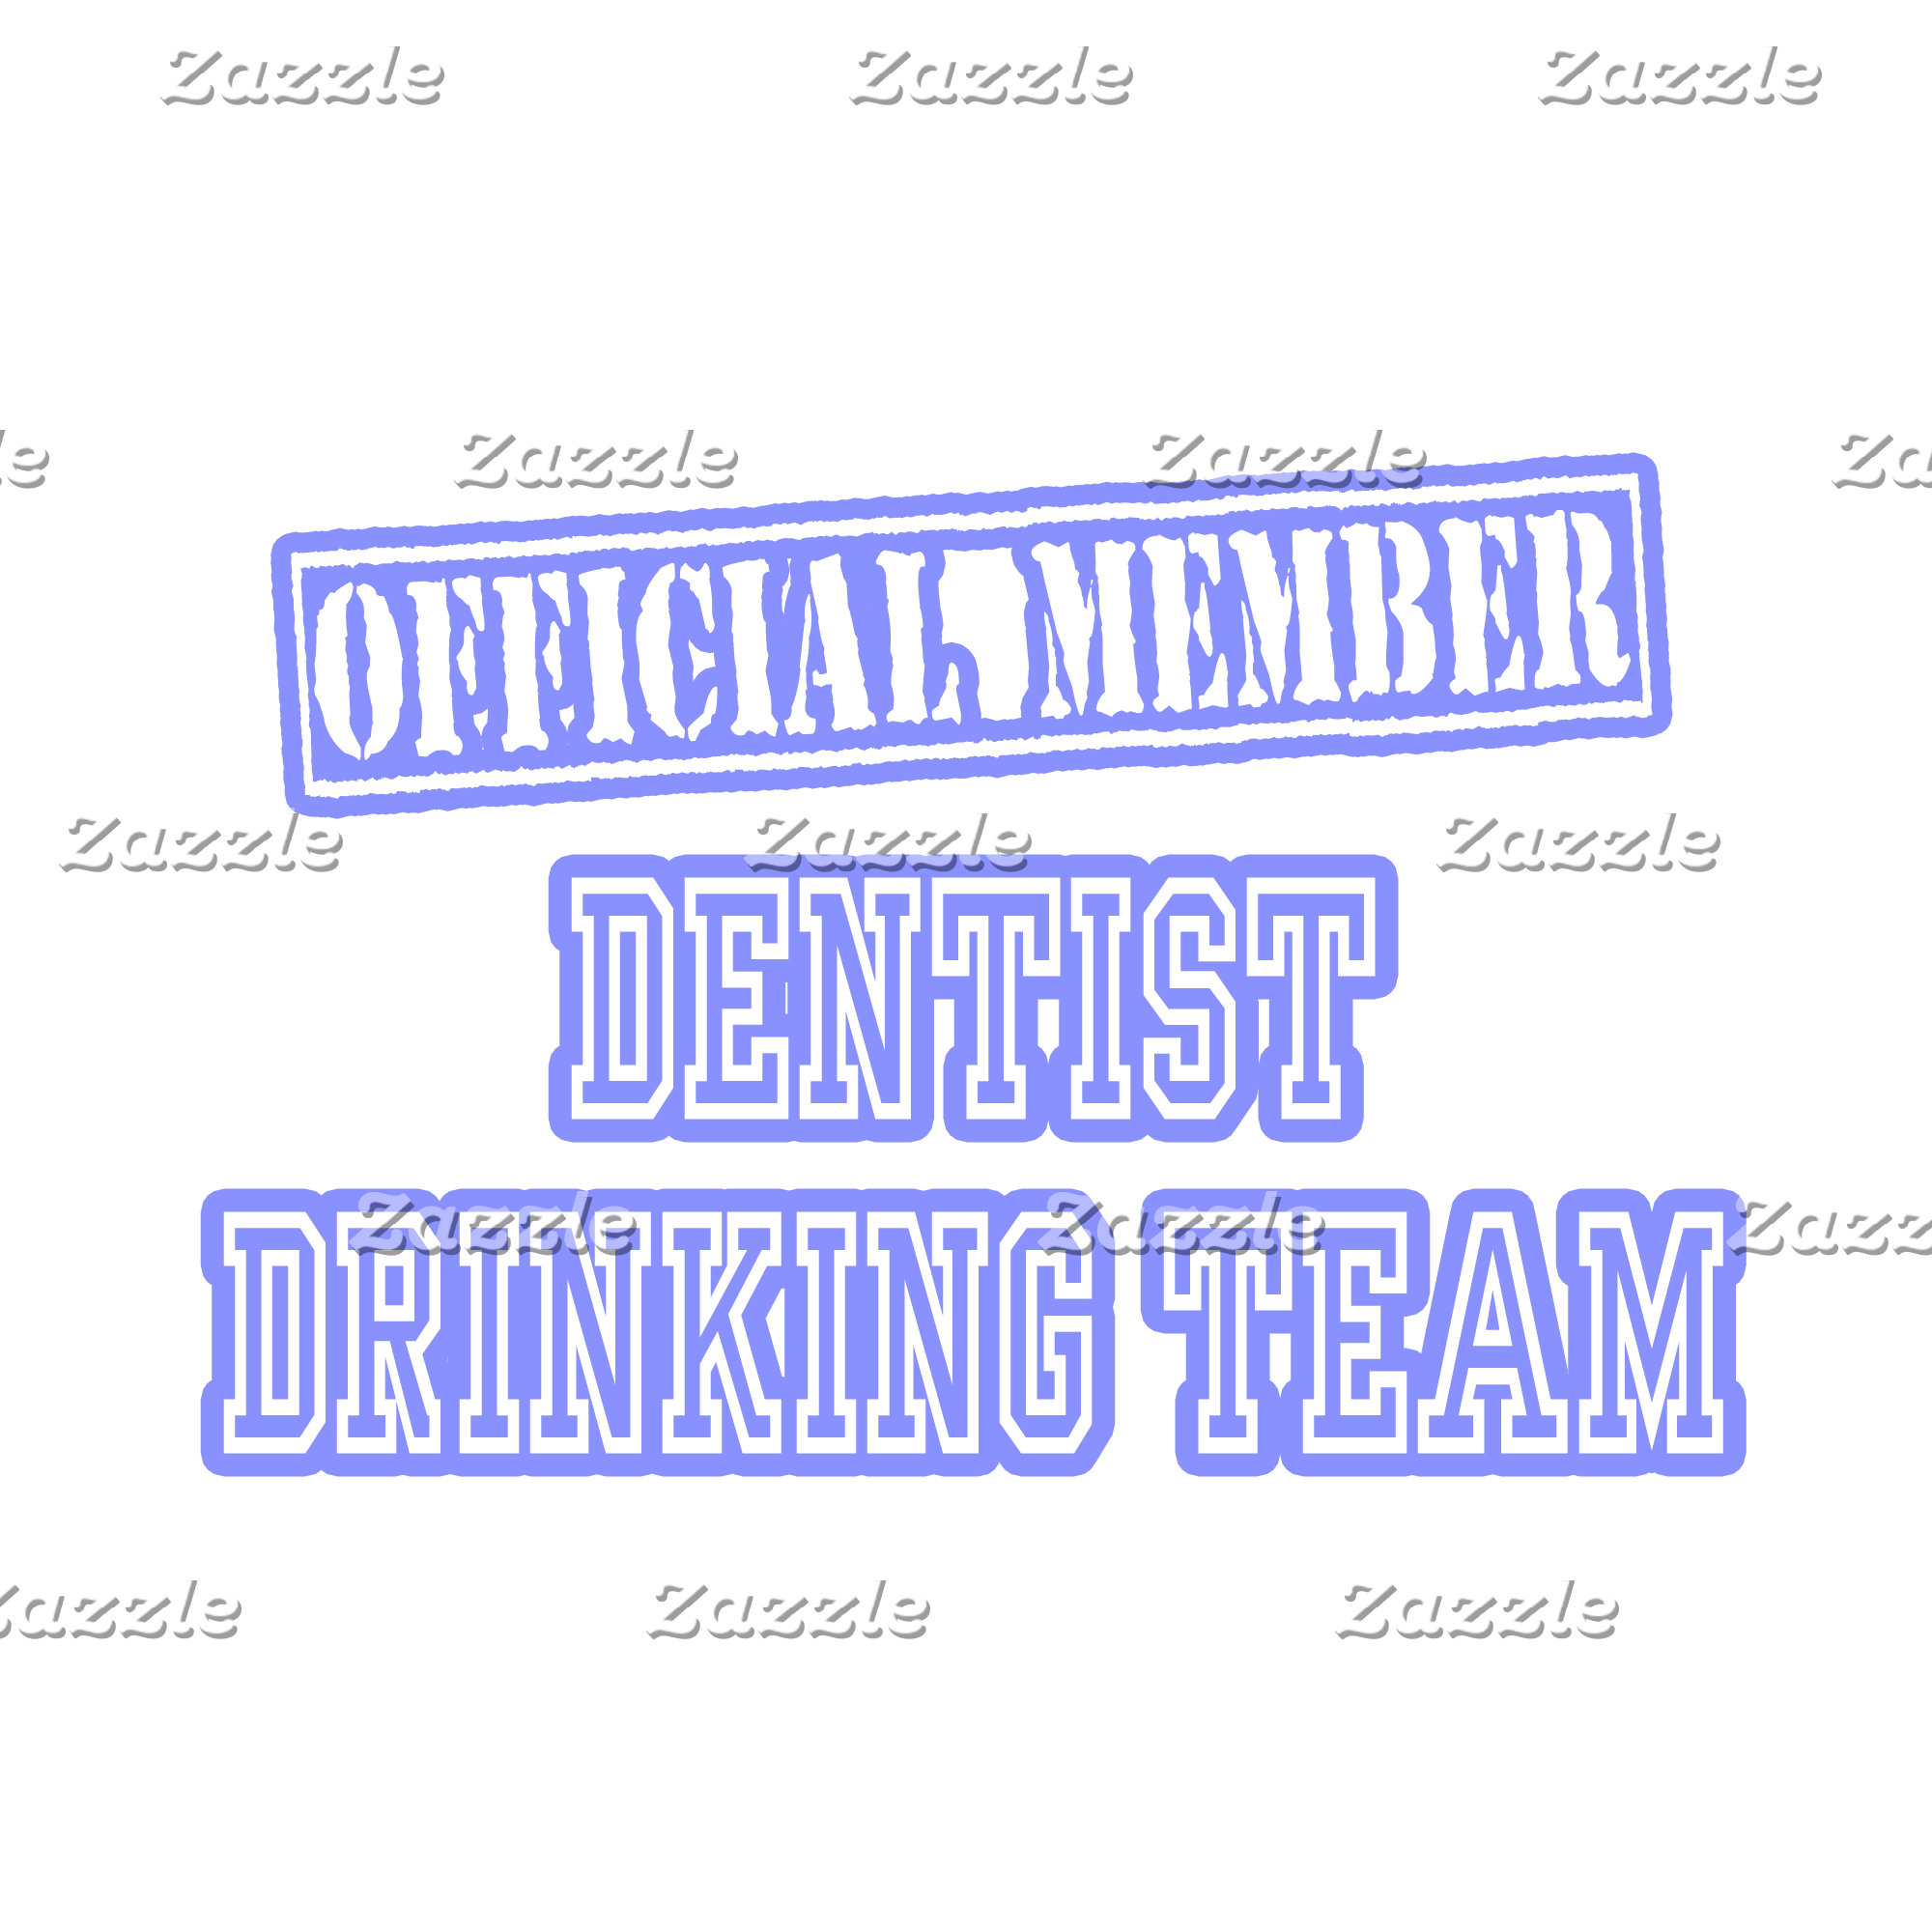 Dentist Drinking Team